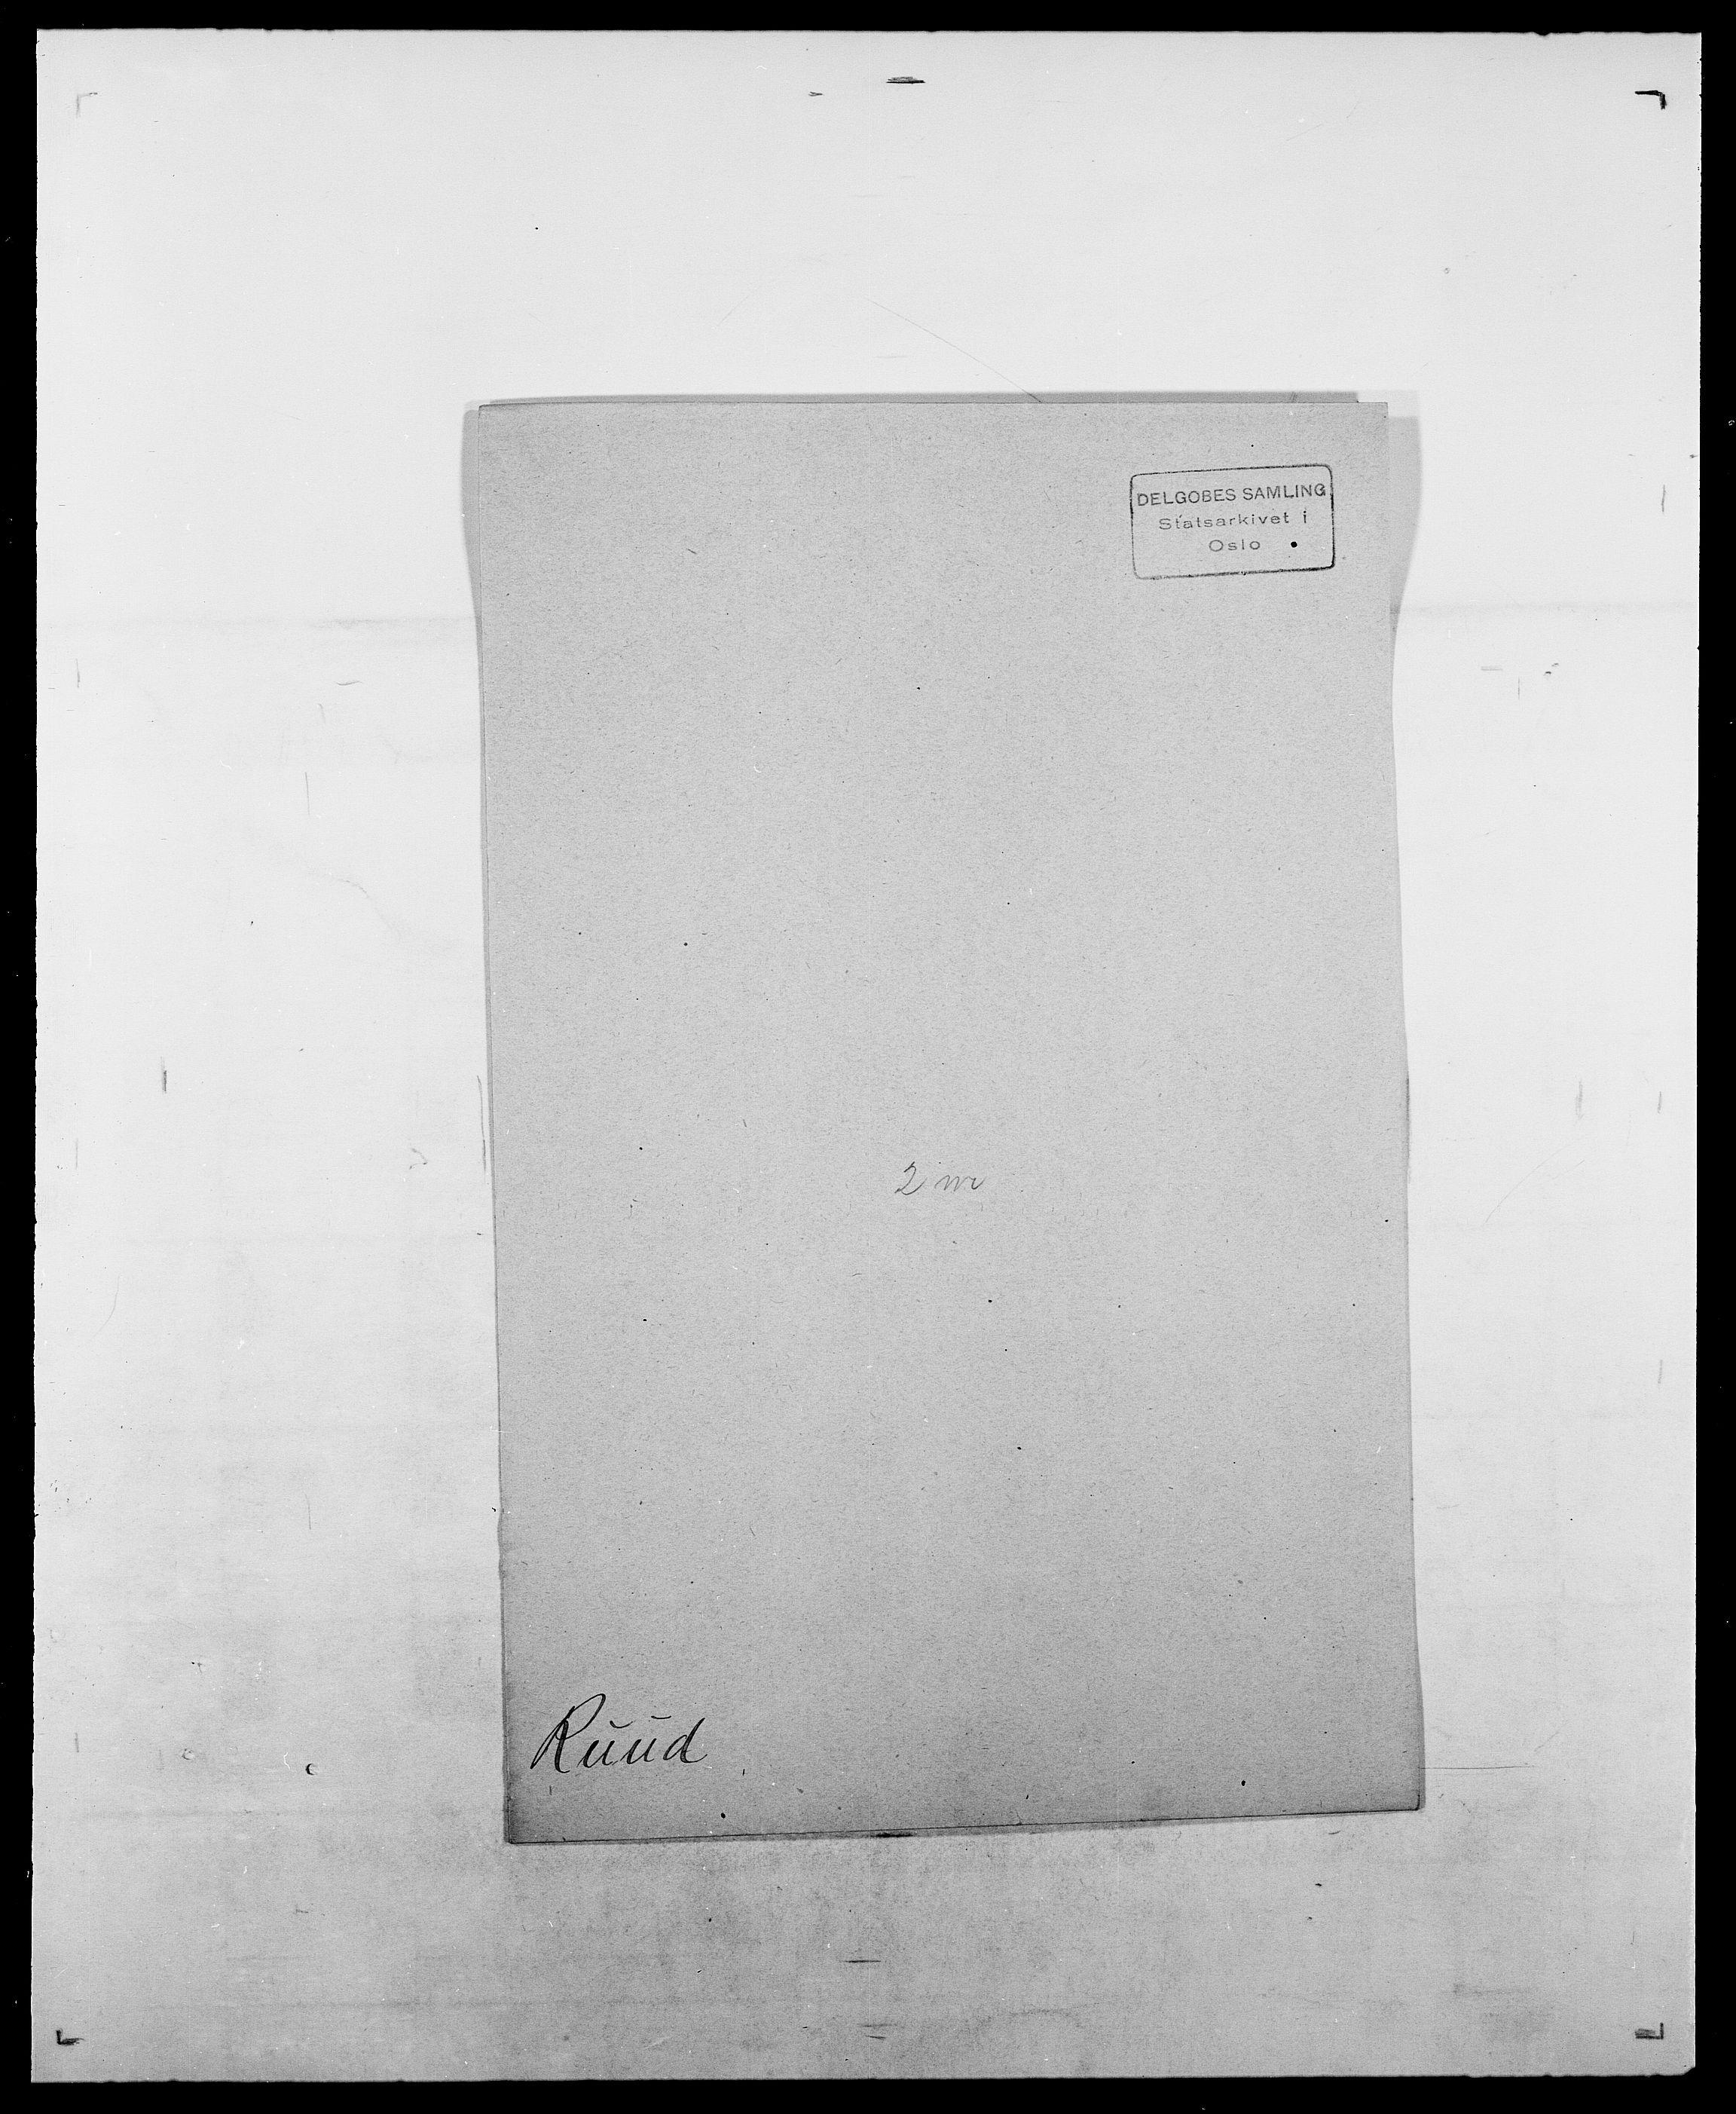 SAO, Delgobe, Charles Antoine - samling, D/Da/L0033: Roald - Røyem, s. 502